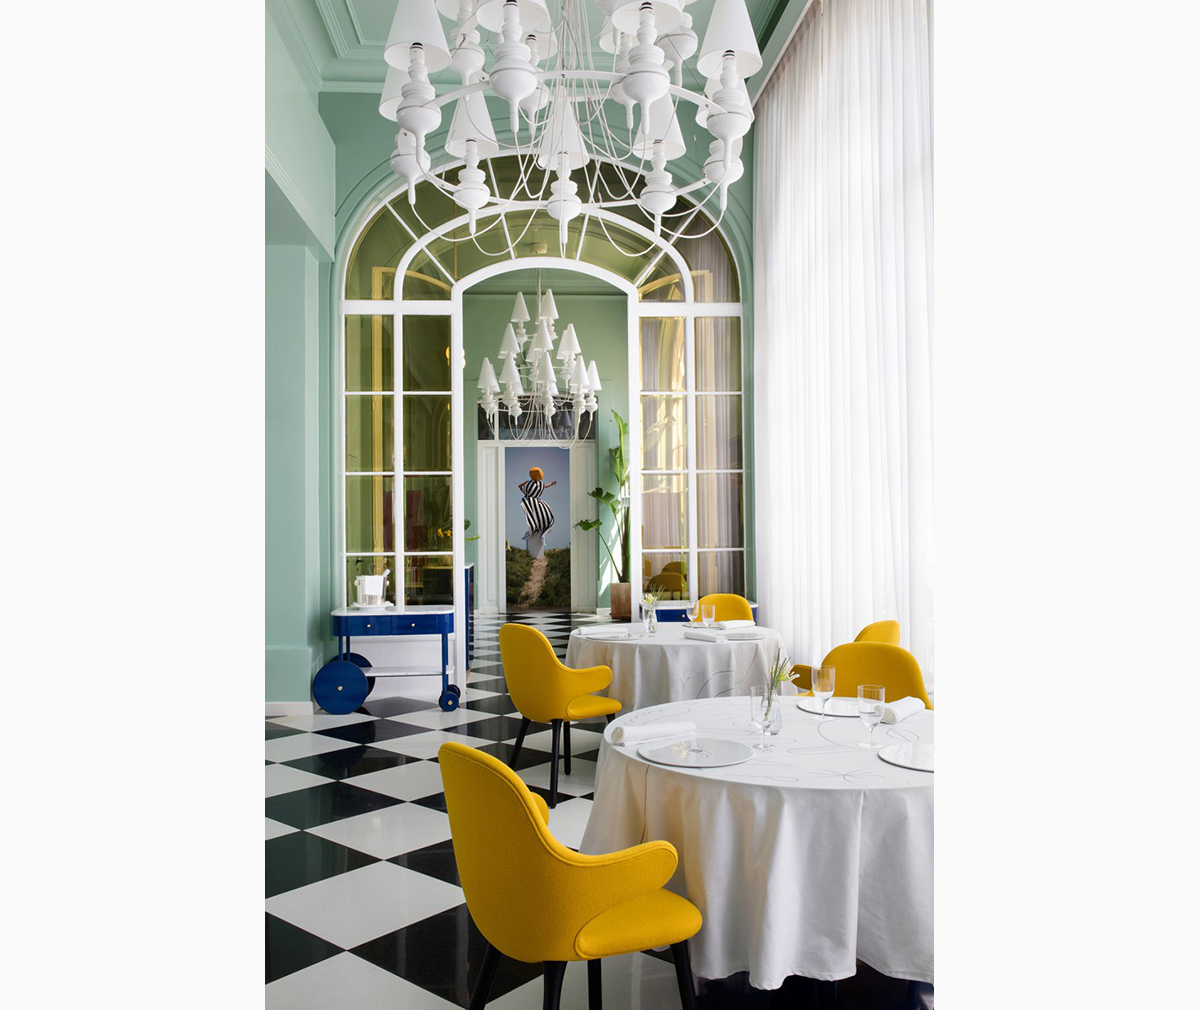 Jaime Hayón gives Madrid's La Terraza del Casino restaurant a playful refresh